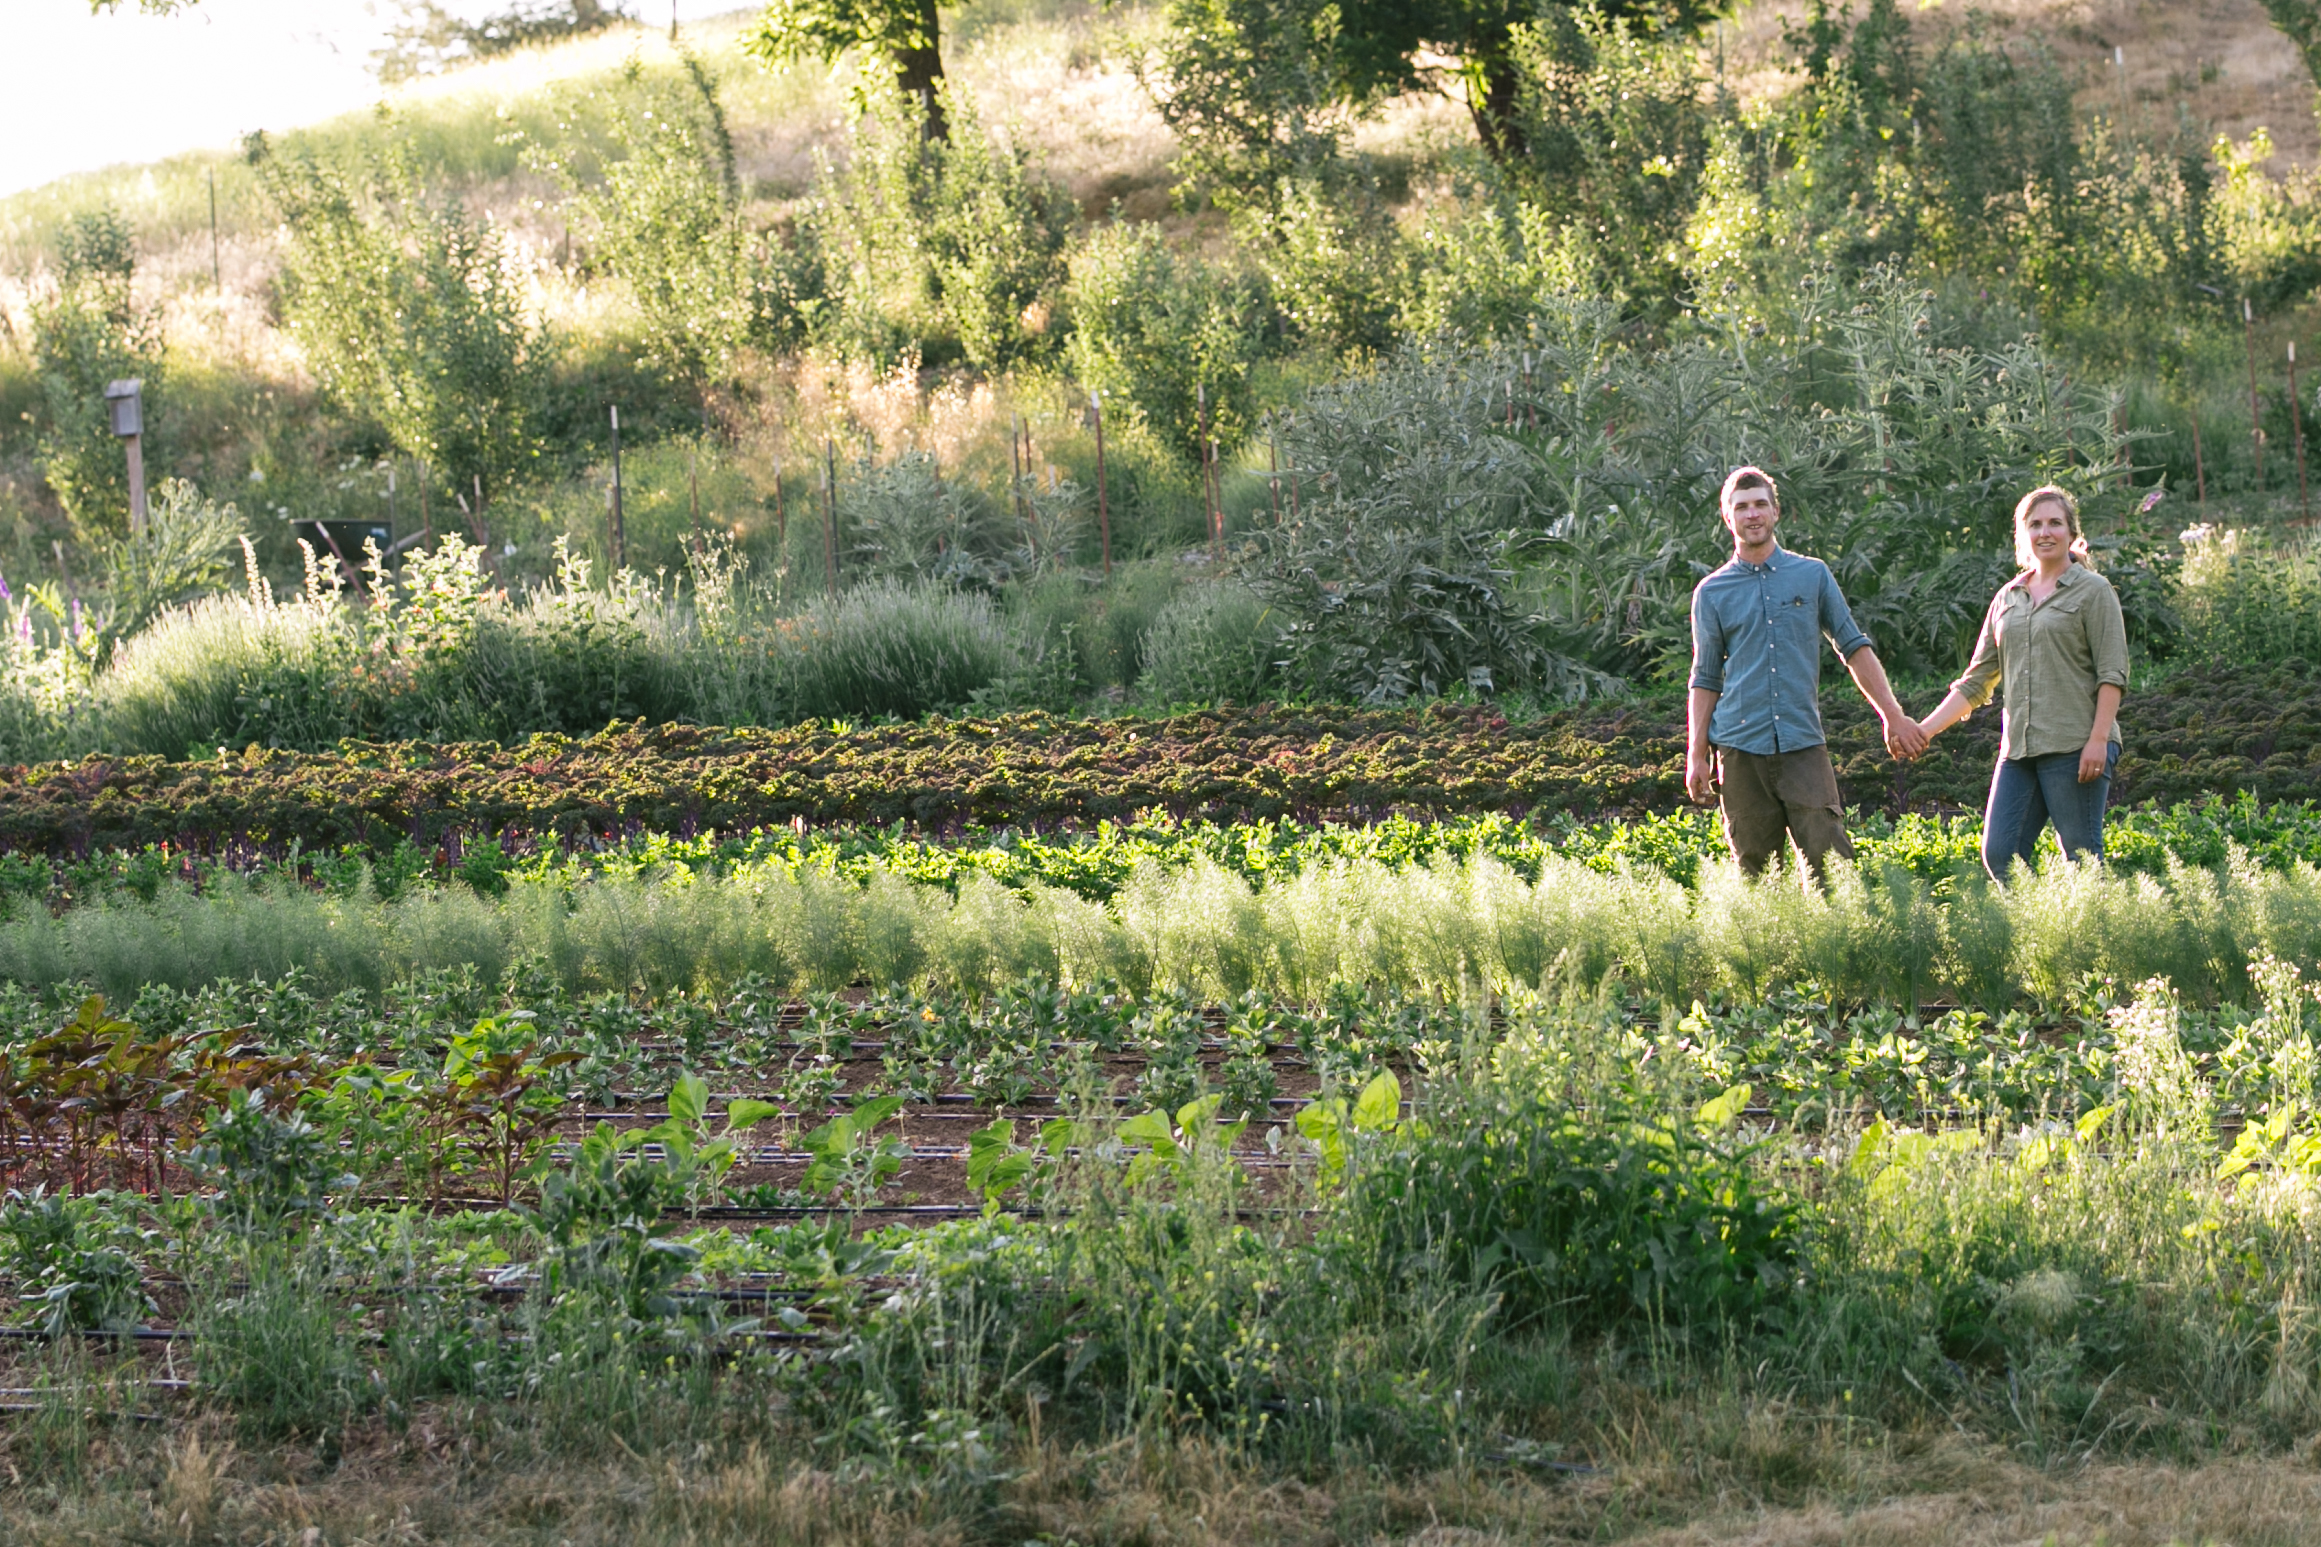 Sweet Roots Farm